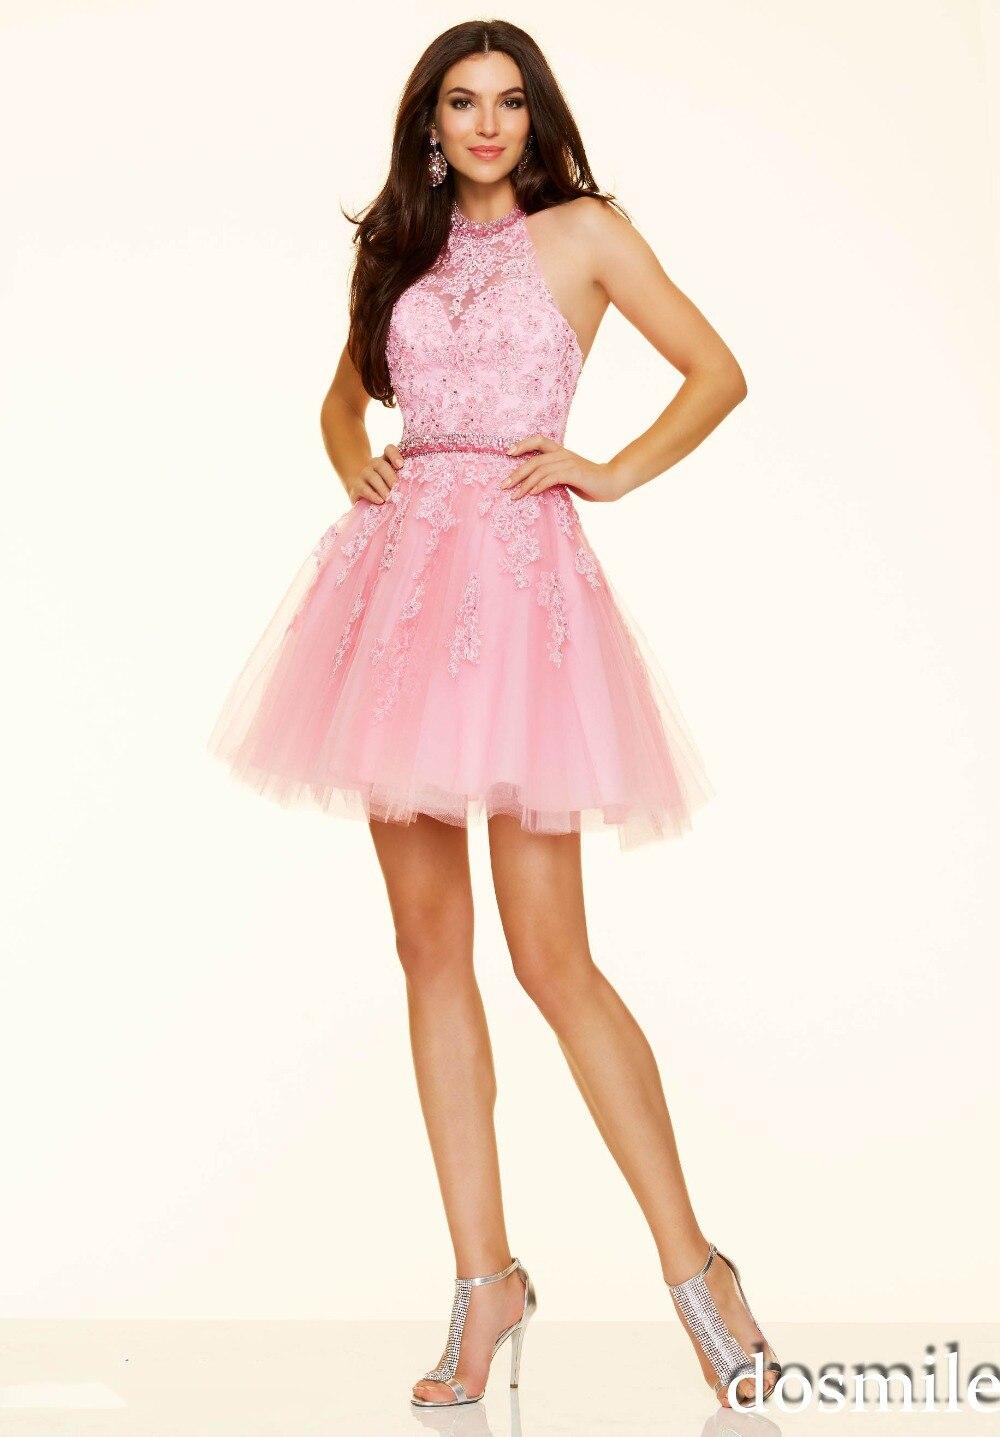 7th Grade Dance Dresses Dress Images